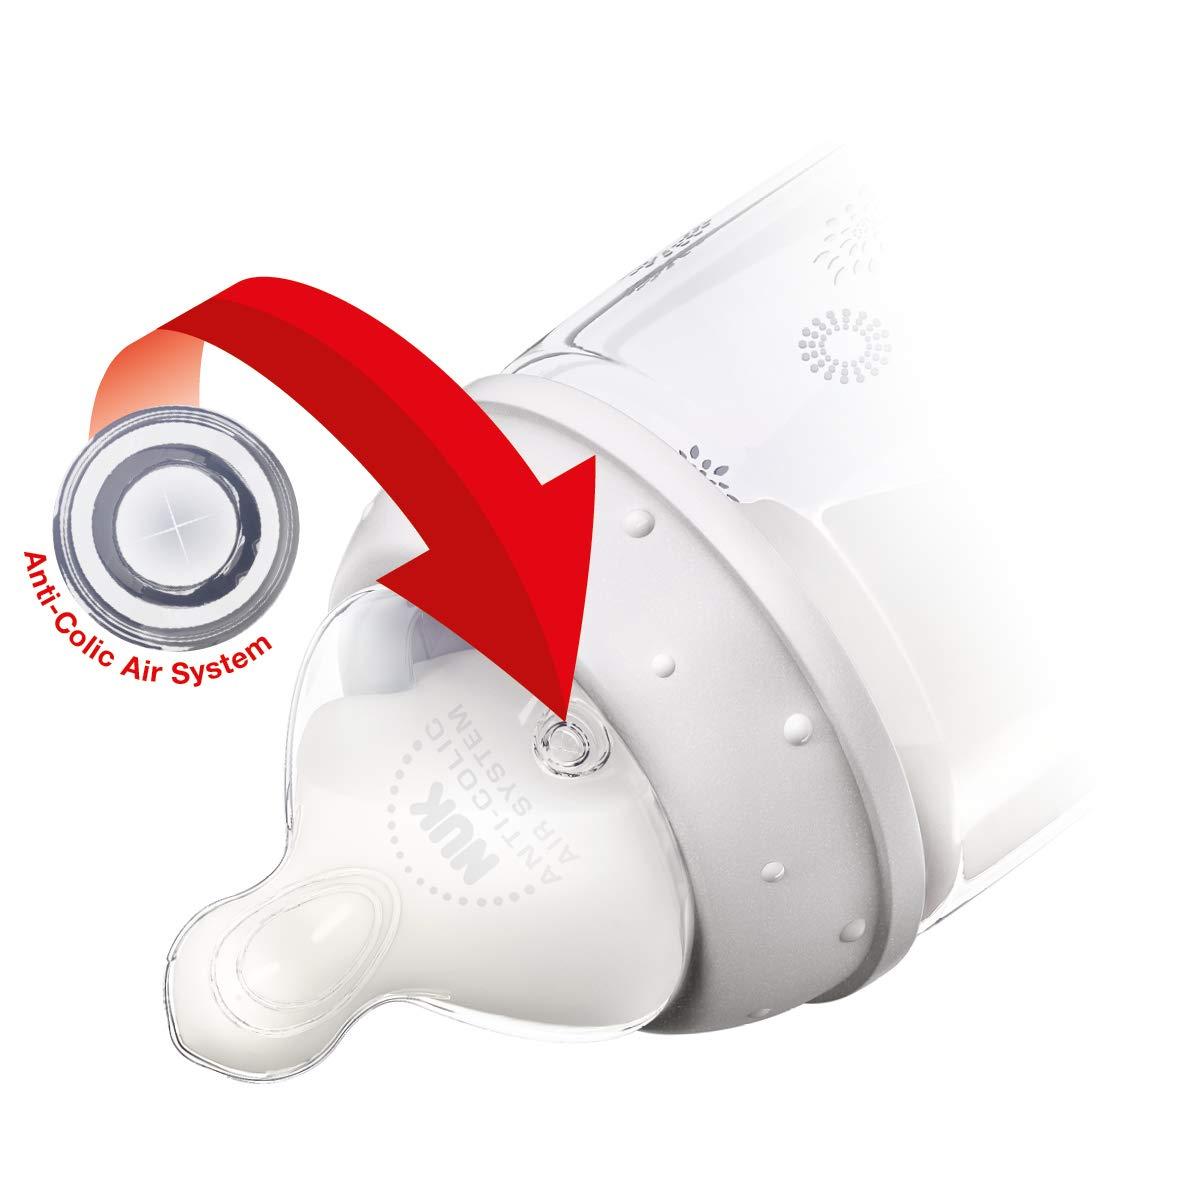 Nuk Biberon 360 mL T/étine Silicone Taille 2 Per/çage M